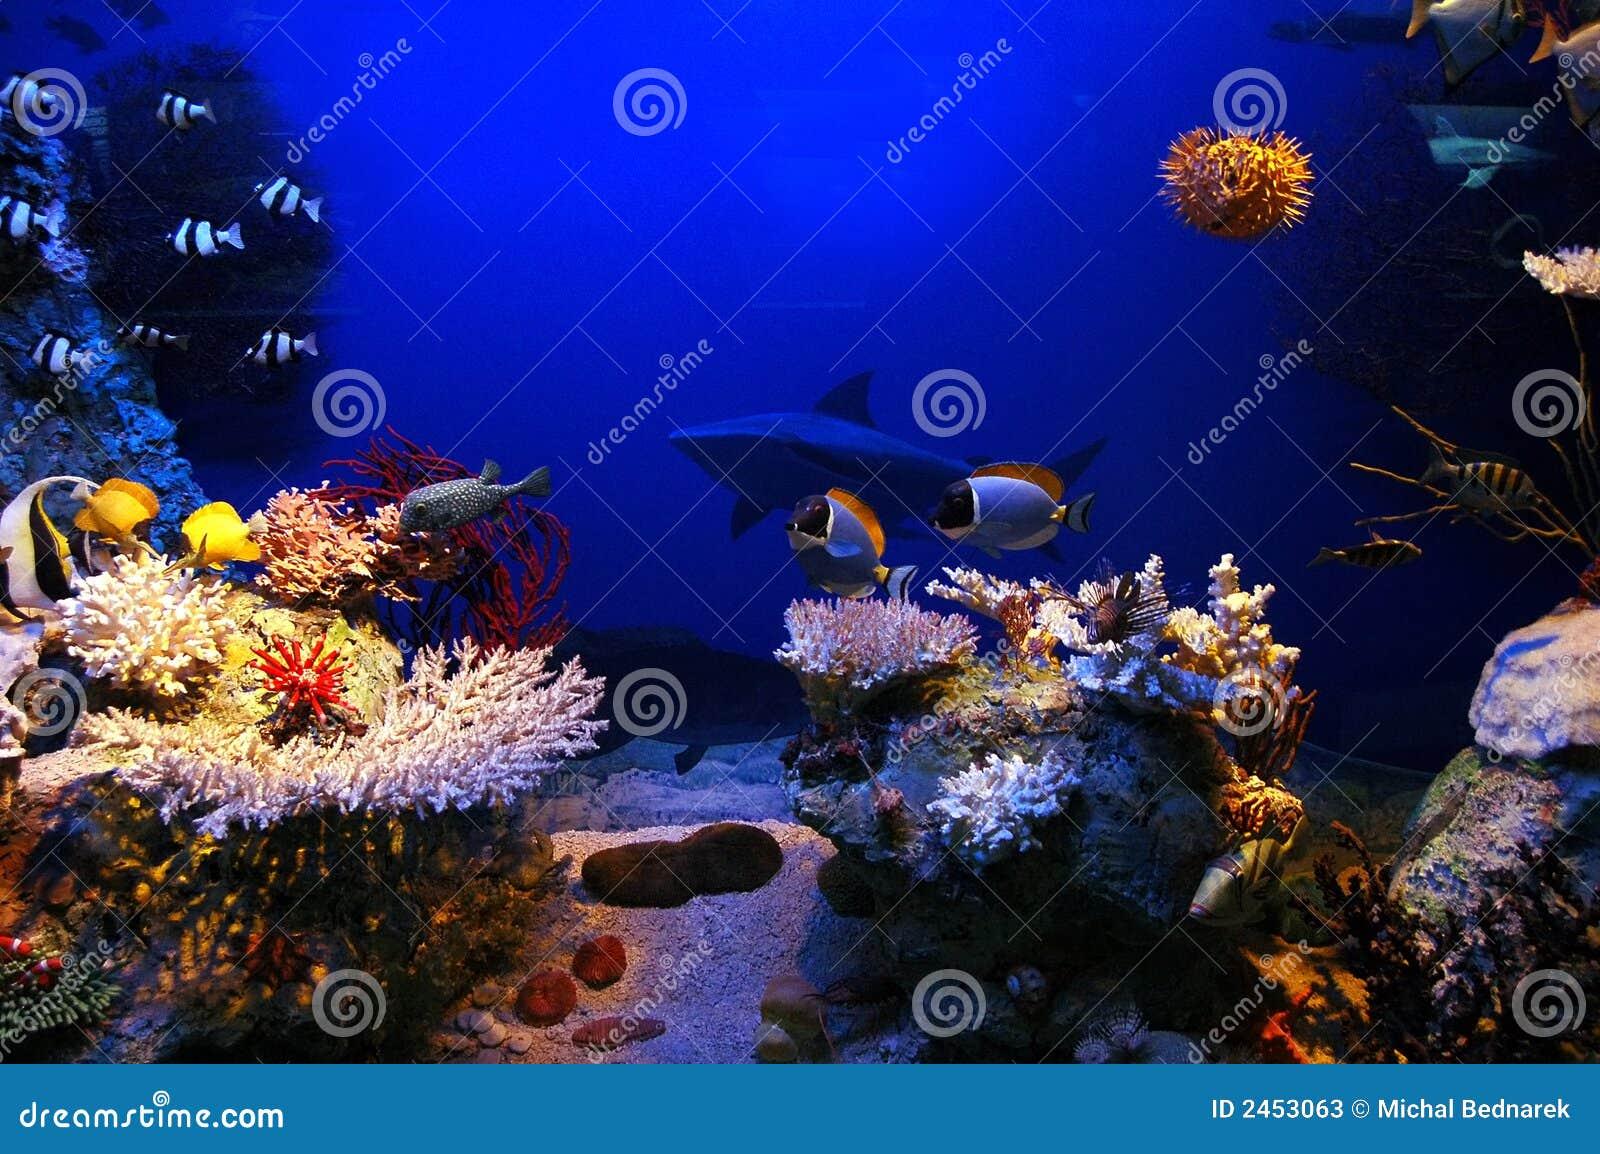 Underwater back... Underwater Fish Scene